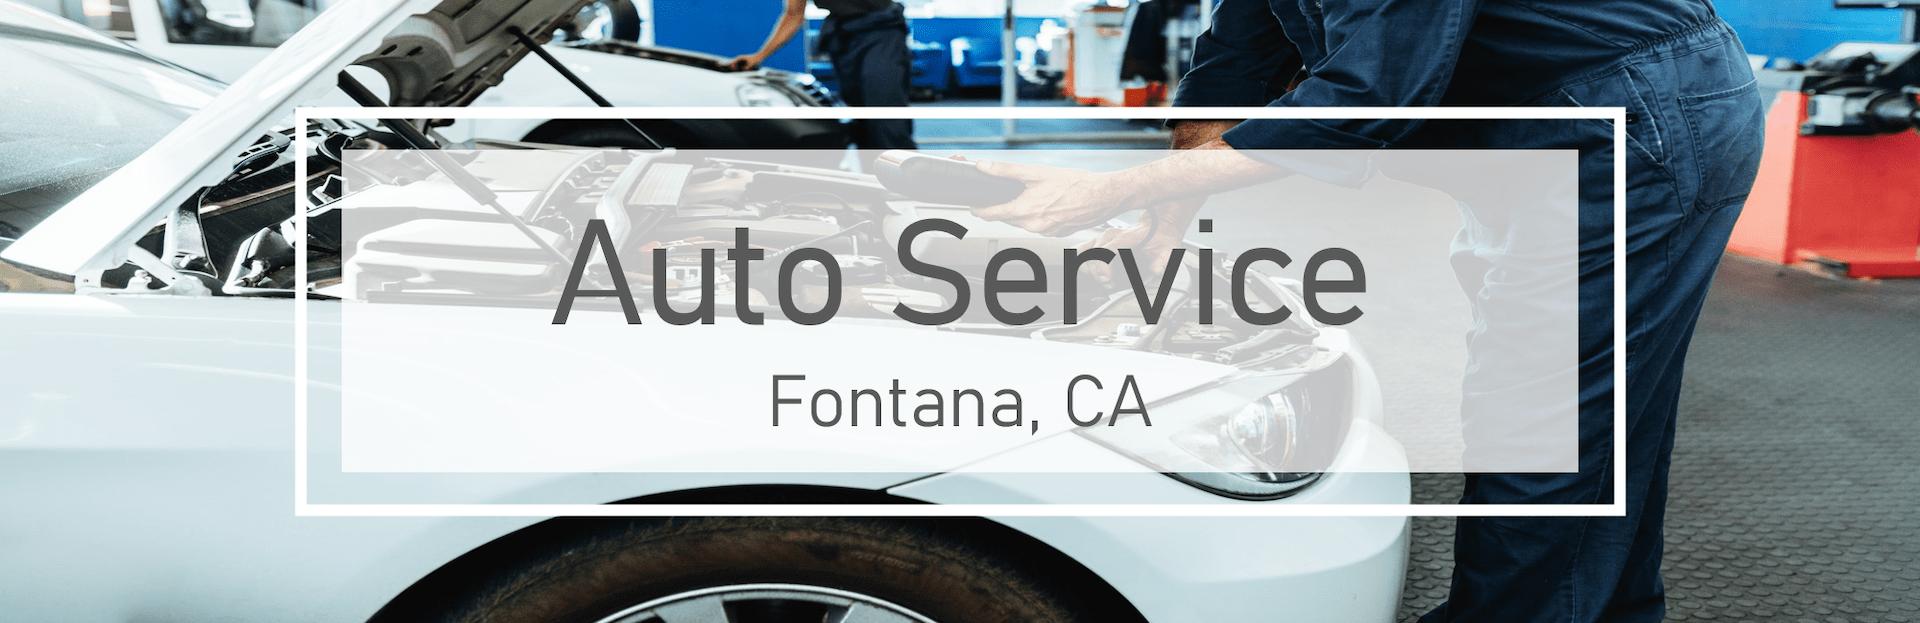 Auto Service Fontana